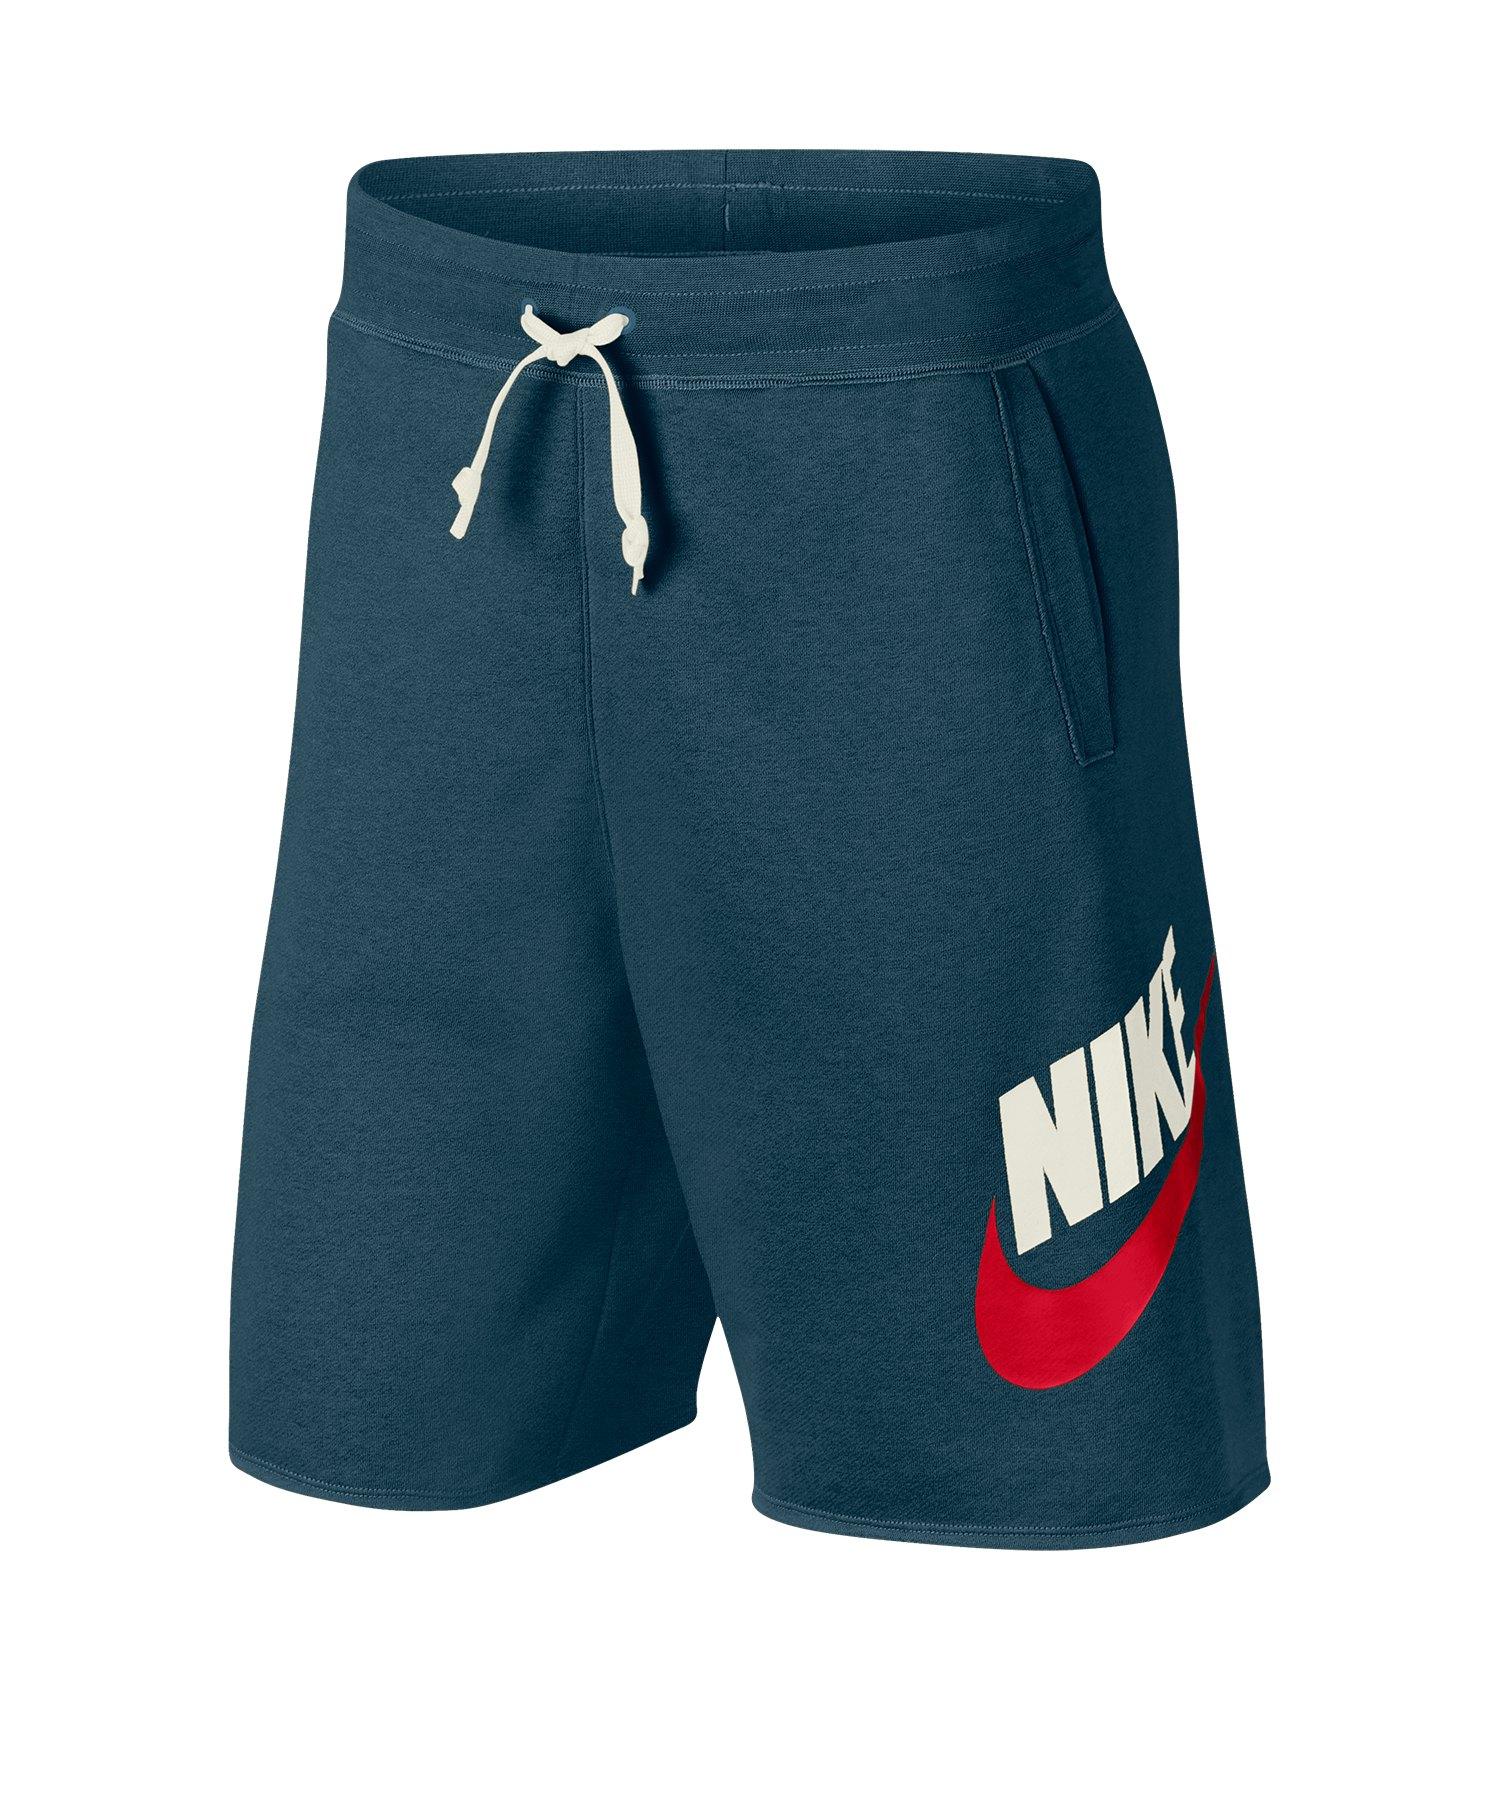 Nike Short Hose kurz Blau Weiss Rot F304 - Gruen